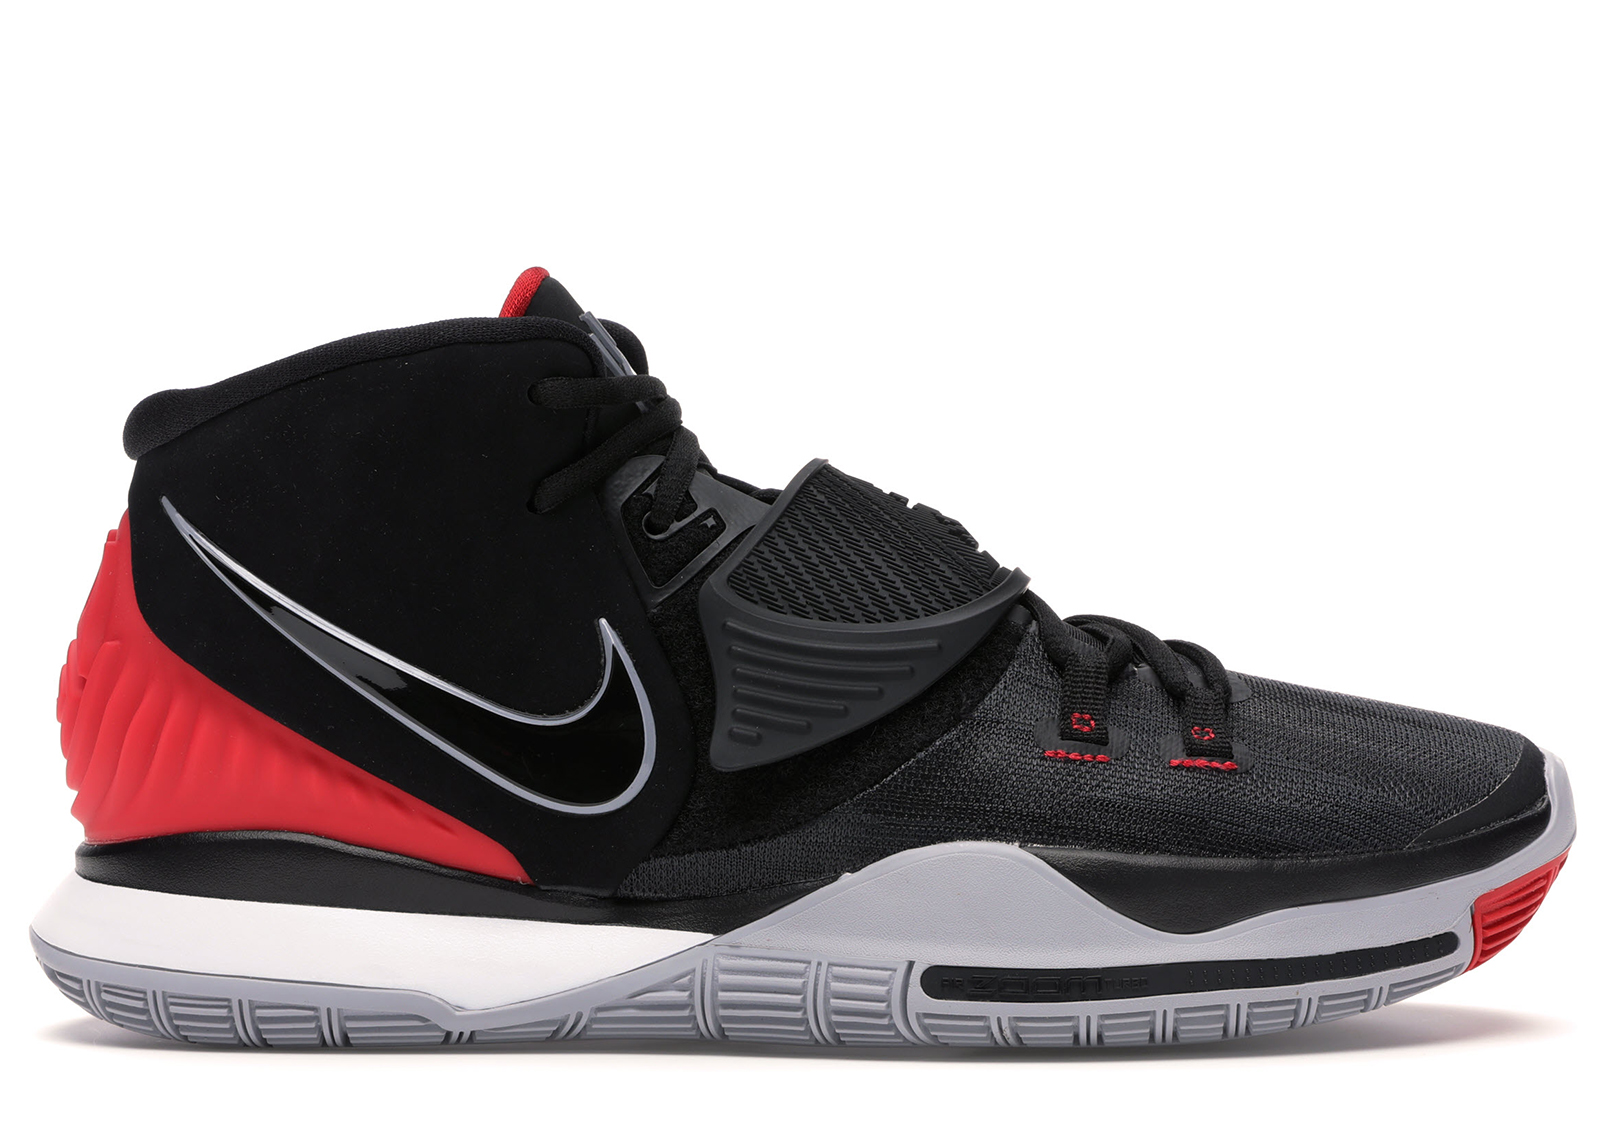 Nike Kyrie 6 Bred - BQ4630-002